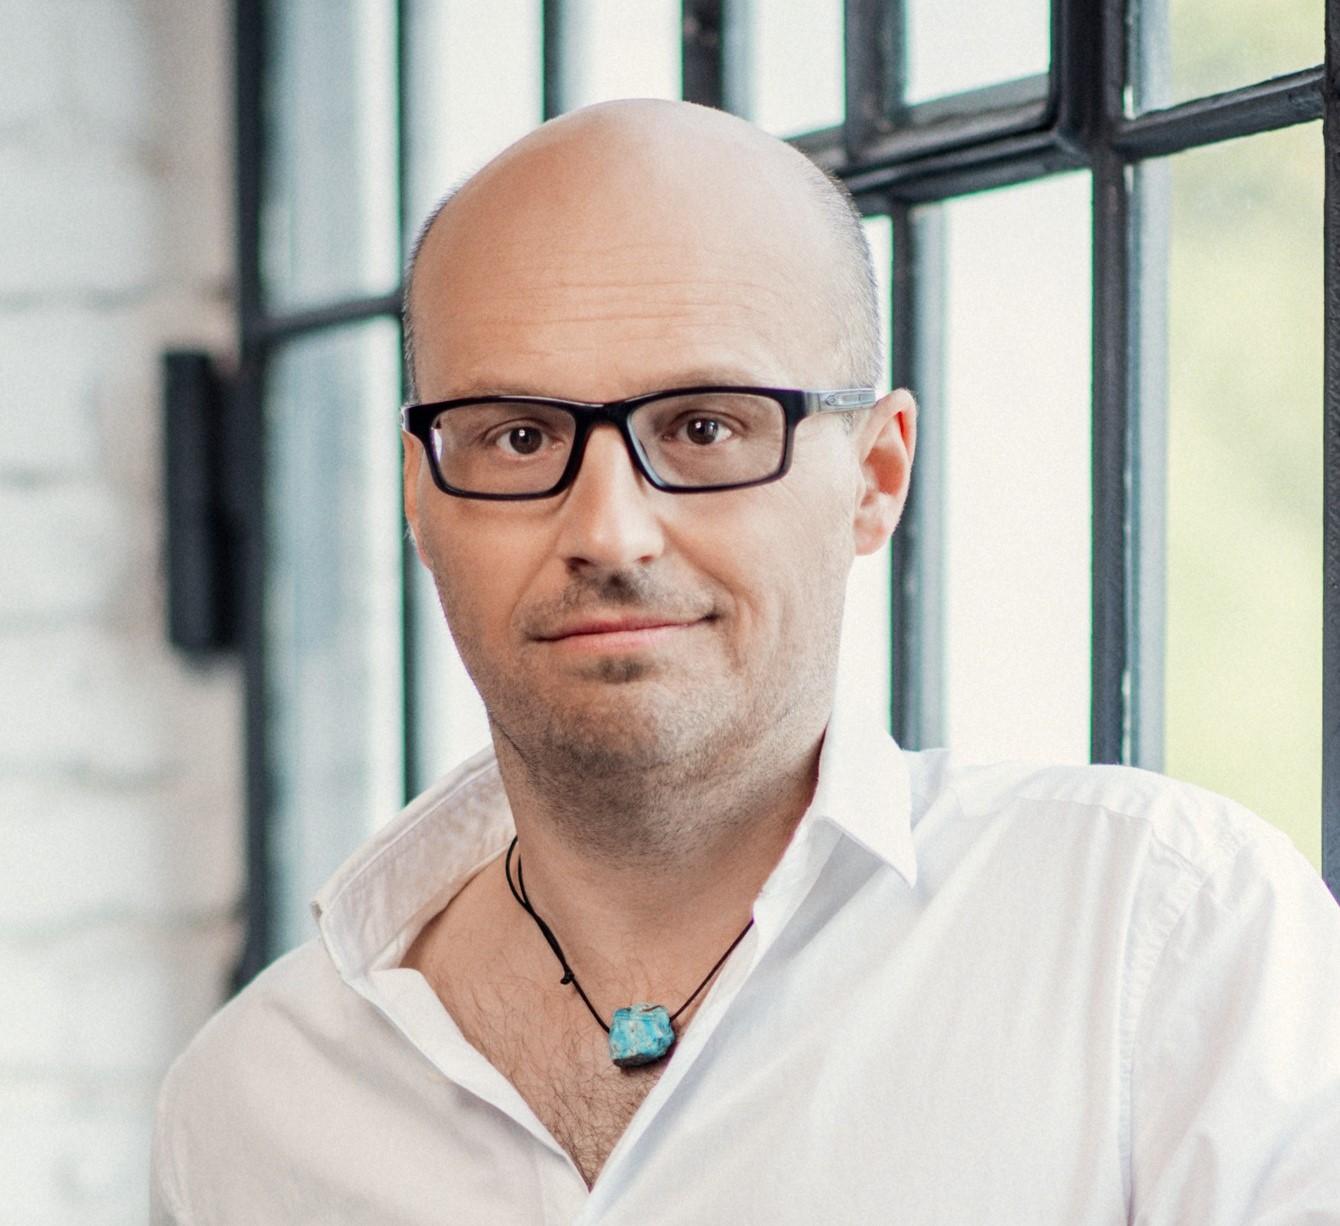 Tomáš Teodosijev